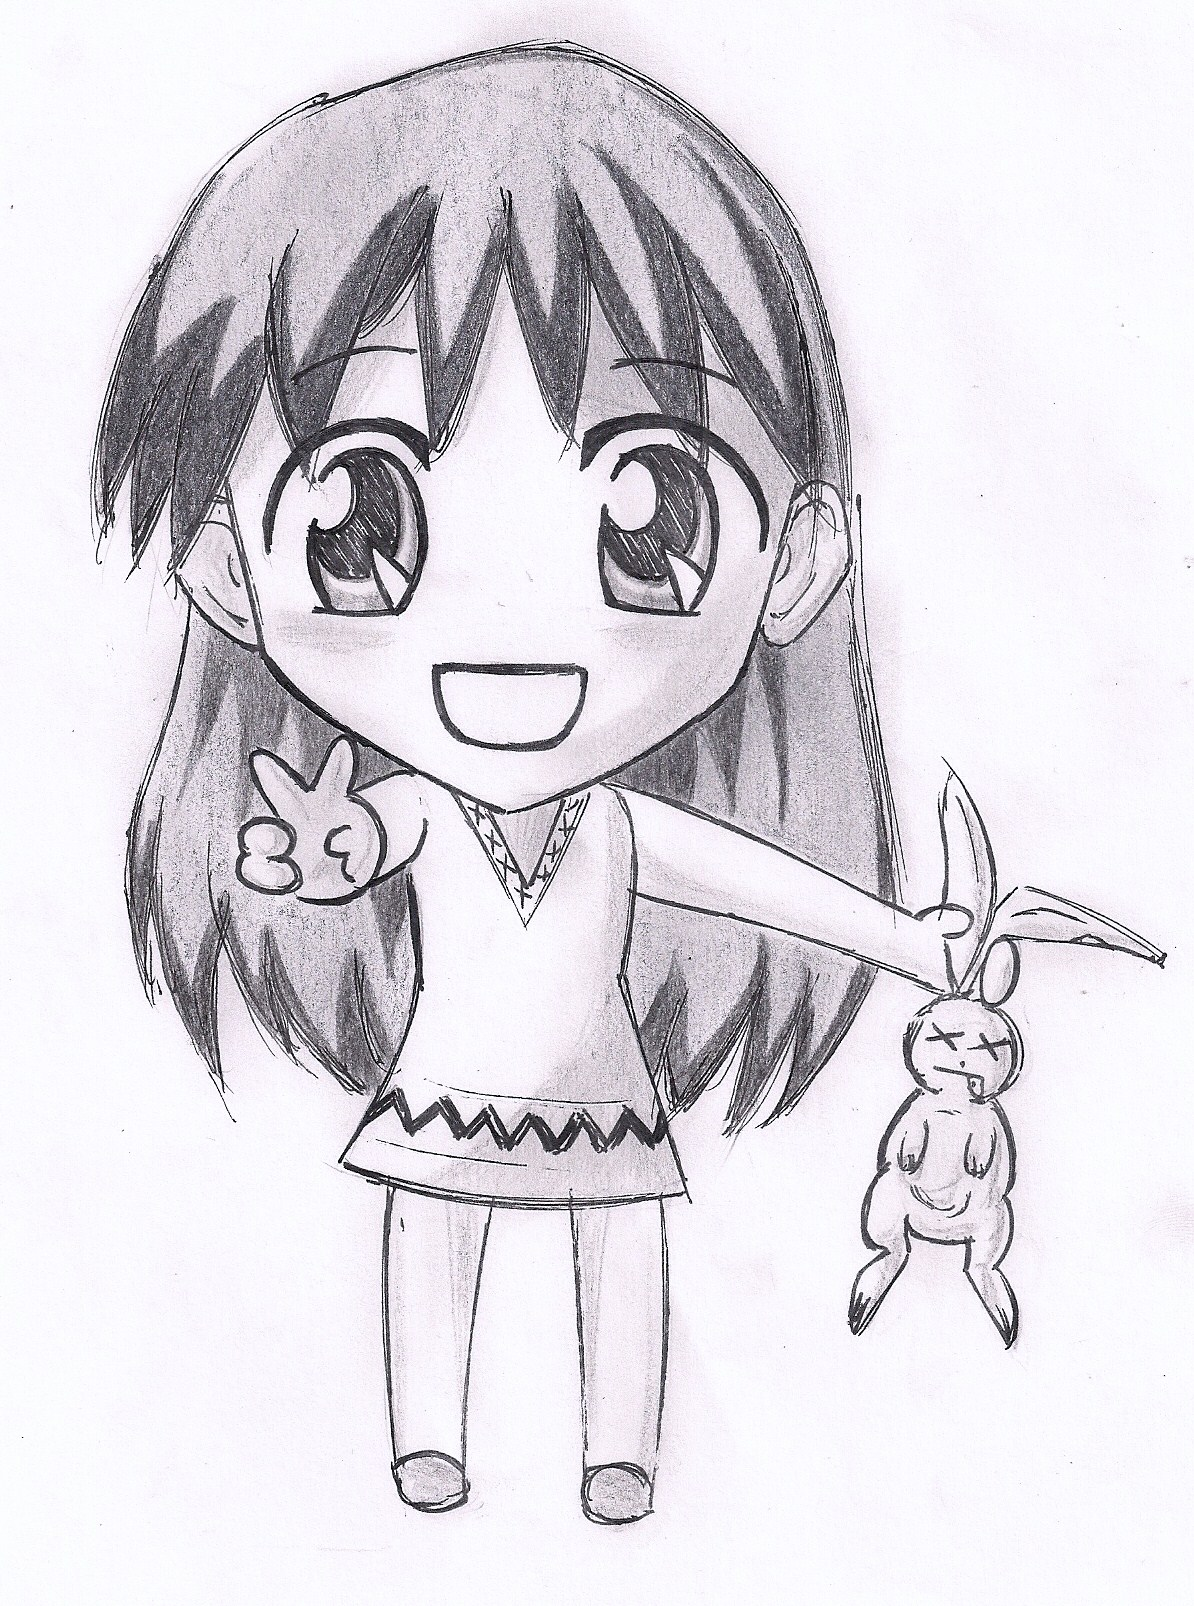 Chibi Girl By YoukoHikari26 On DeviantArt